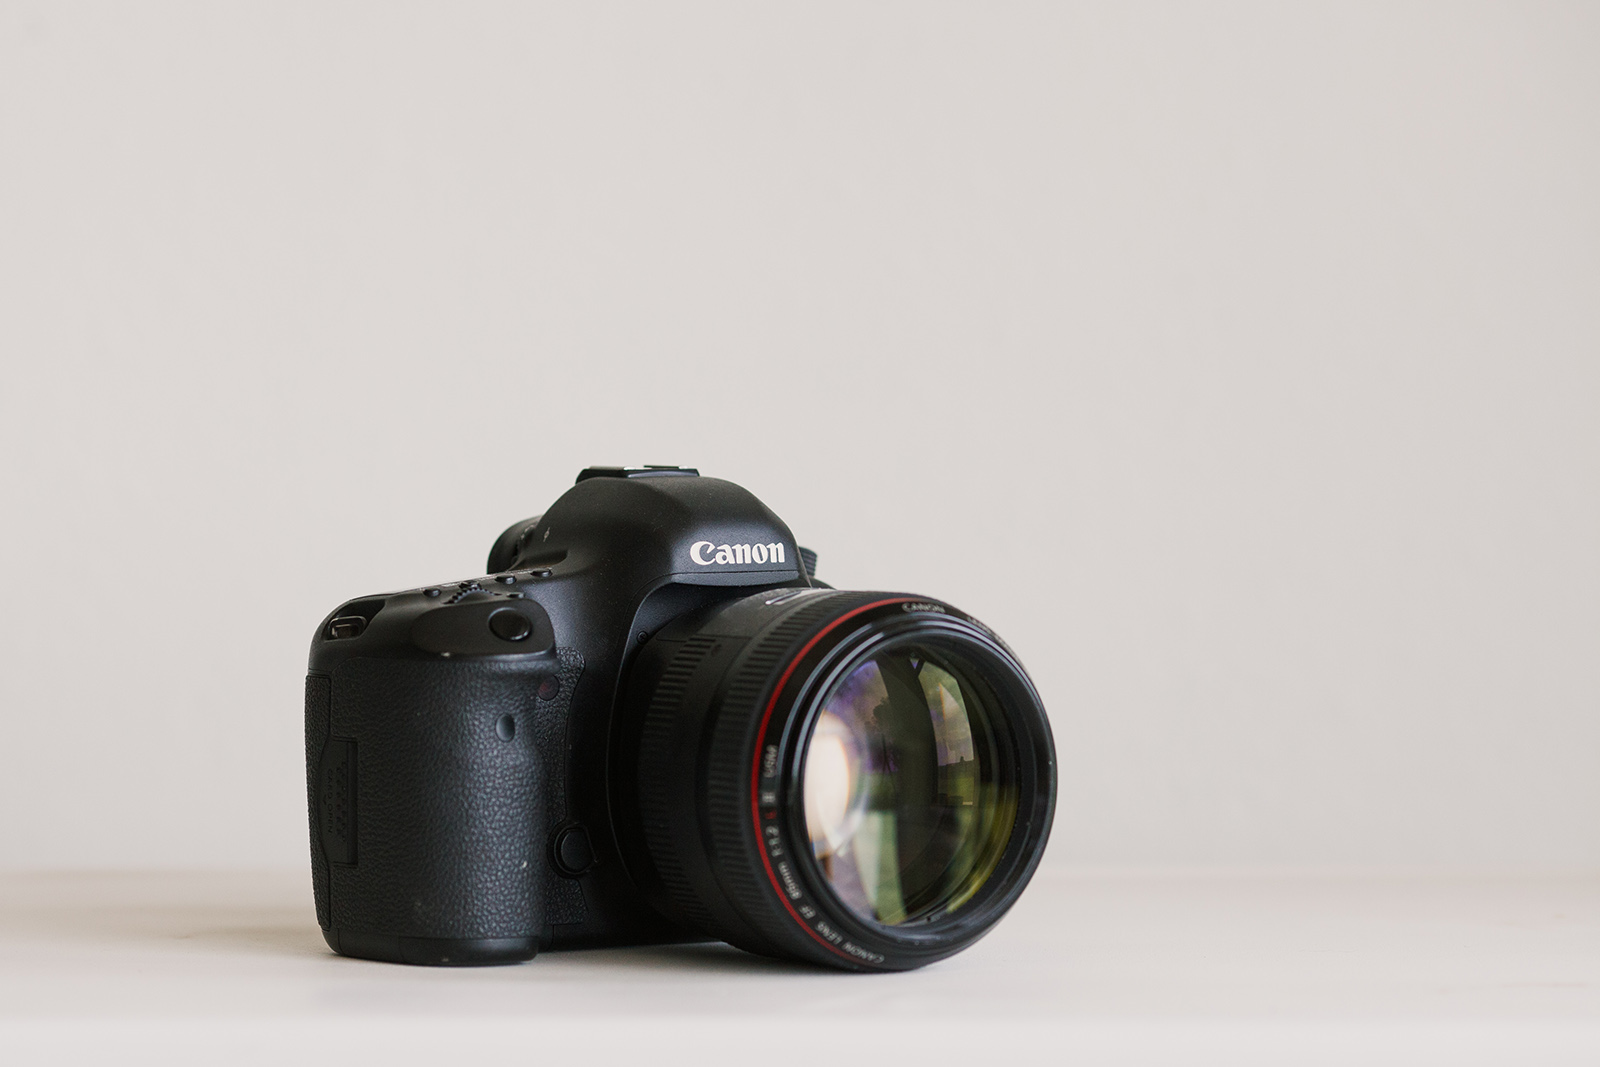 Canon 5d mark III full frame camera